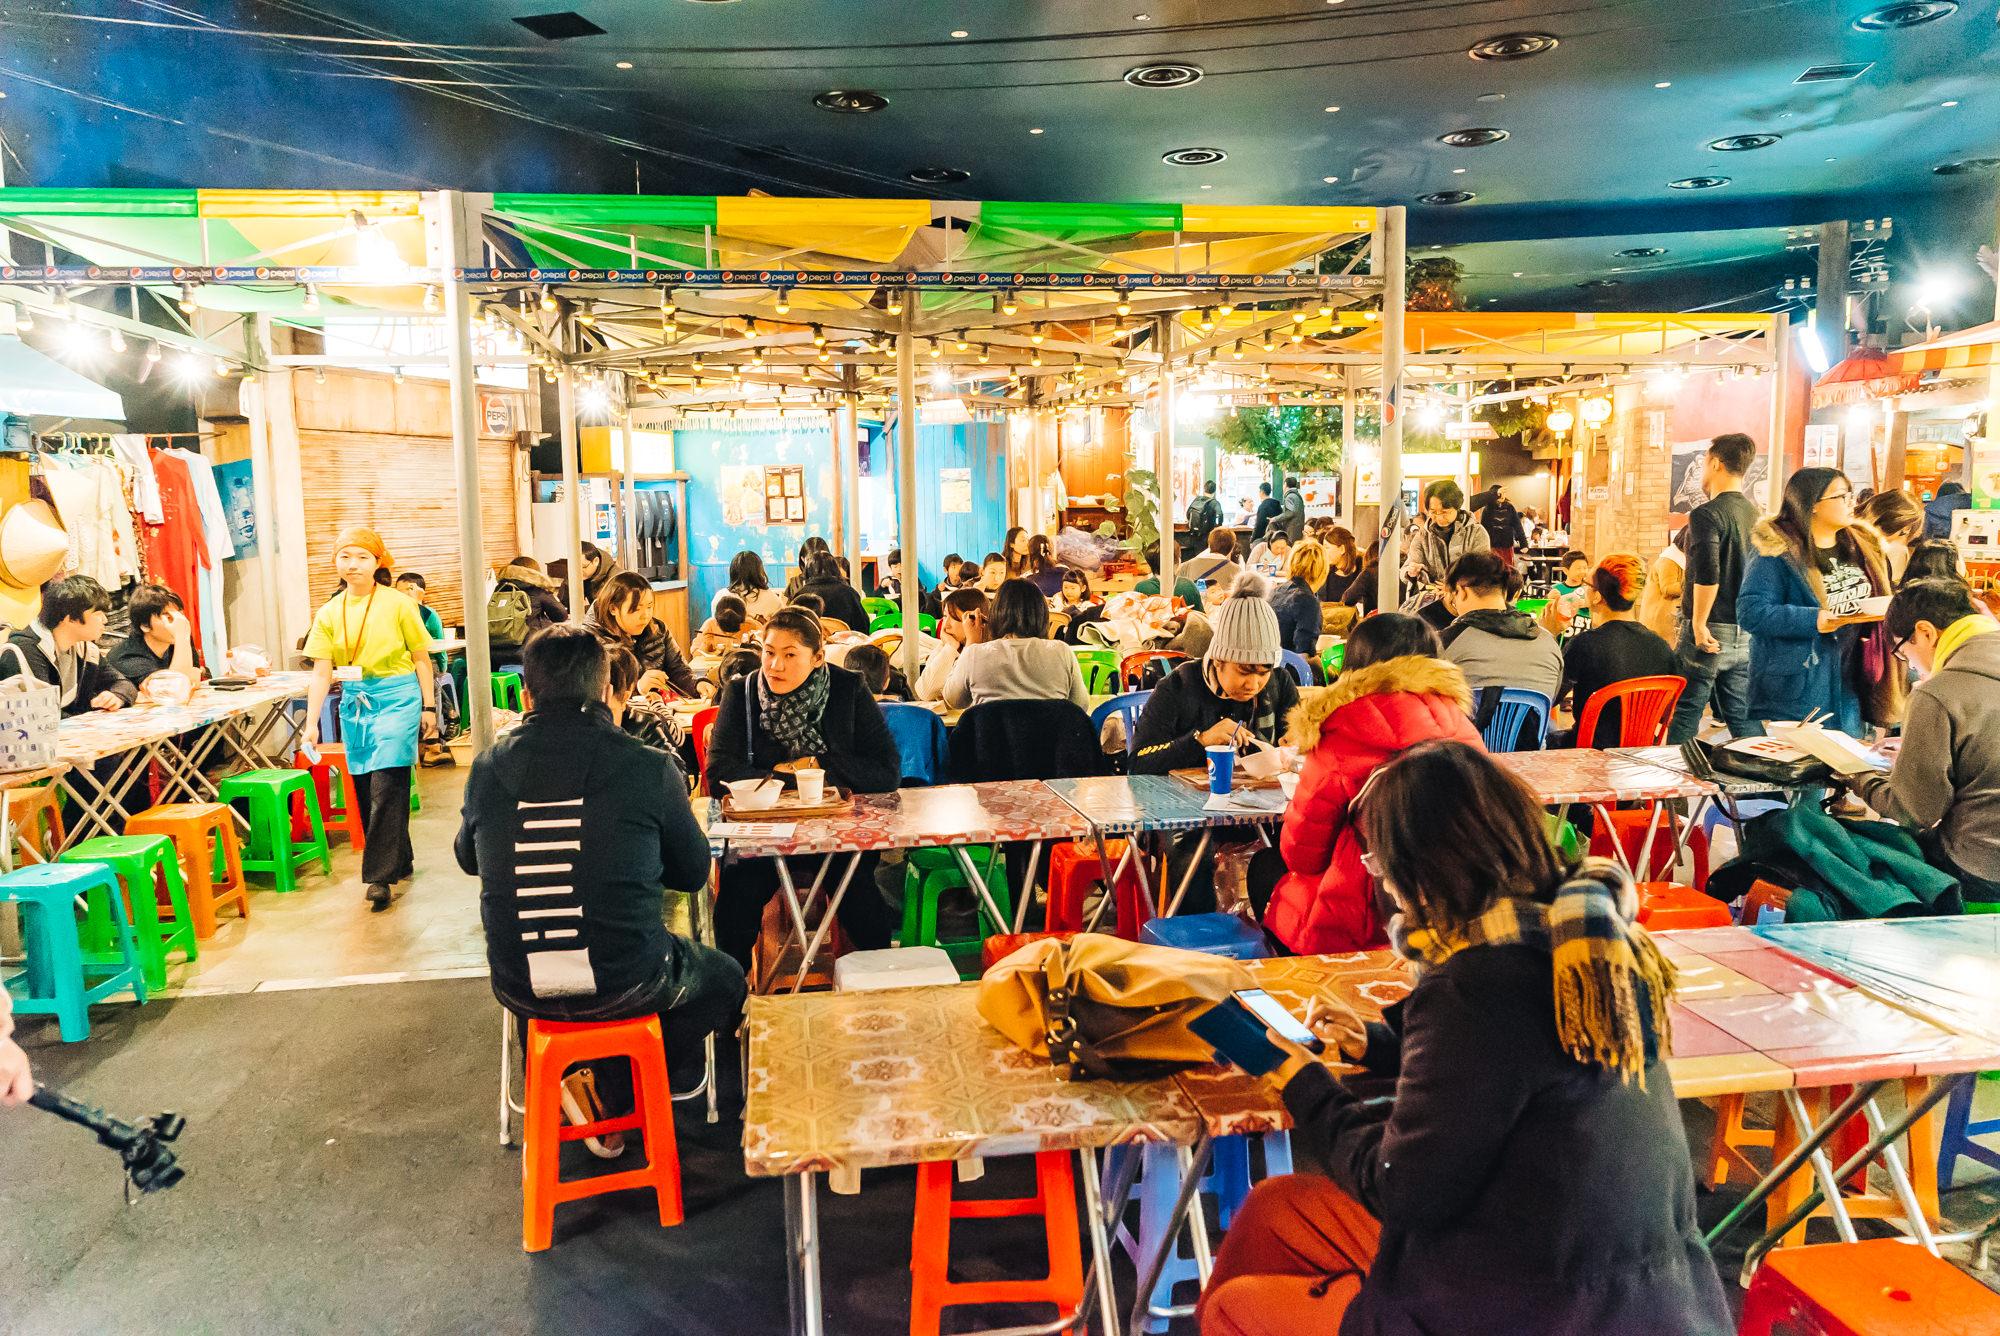 The noodles food court